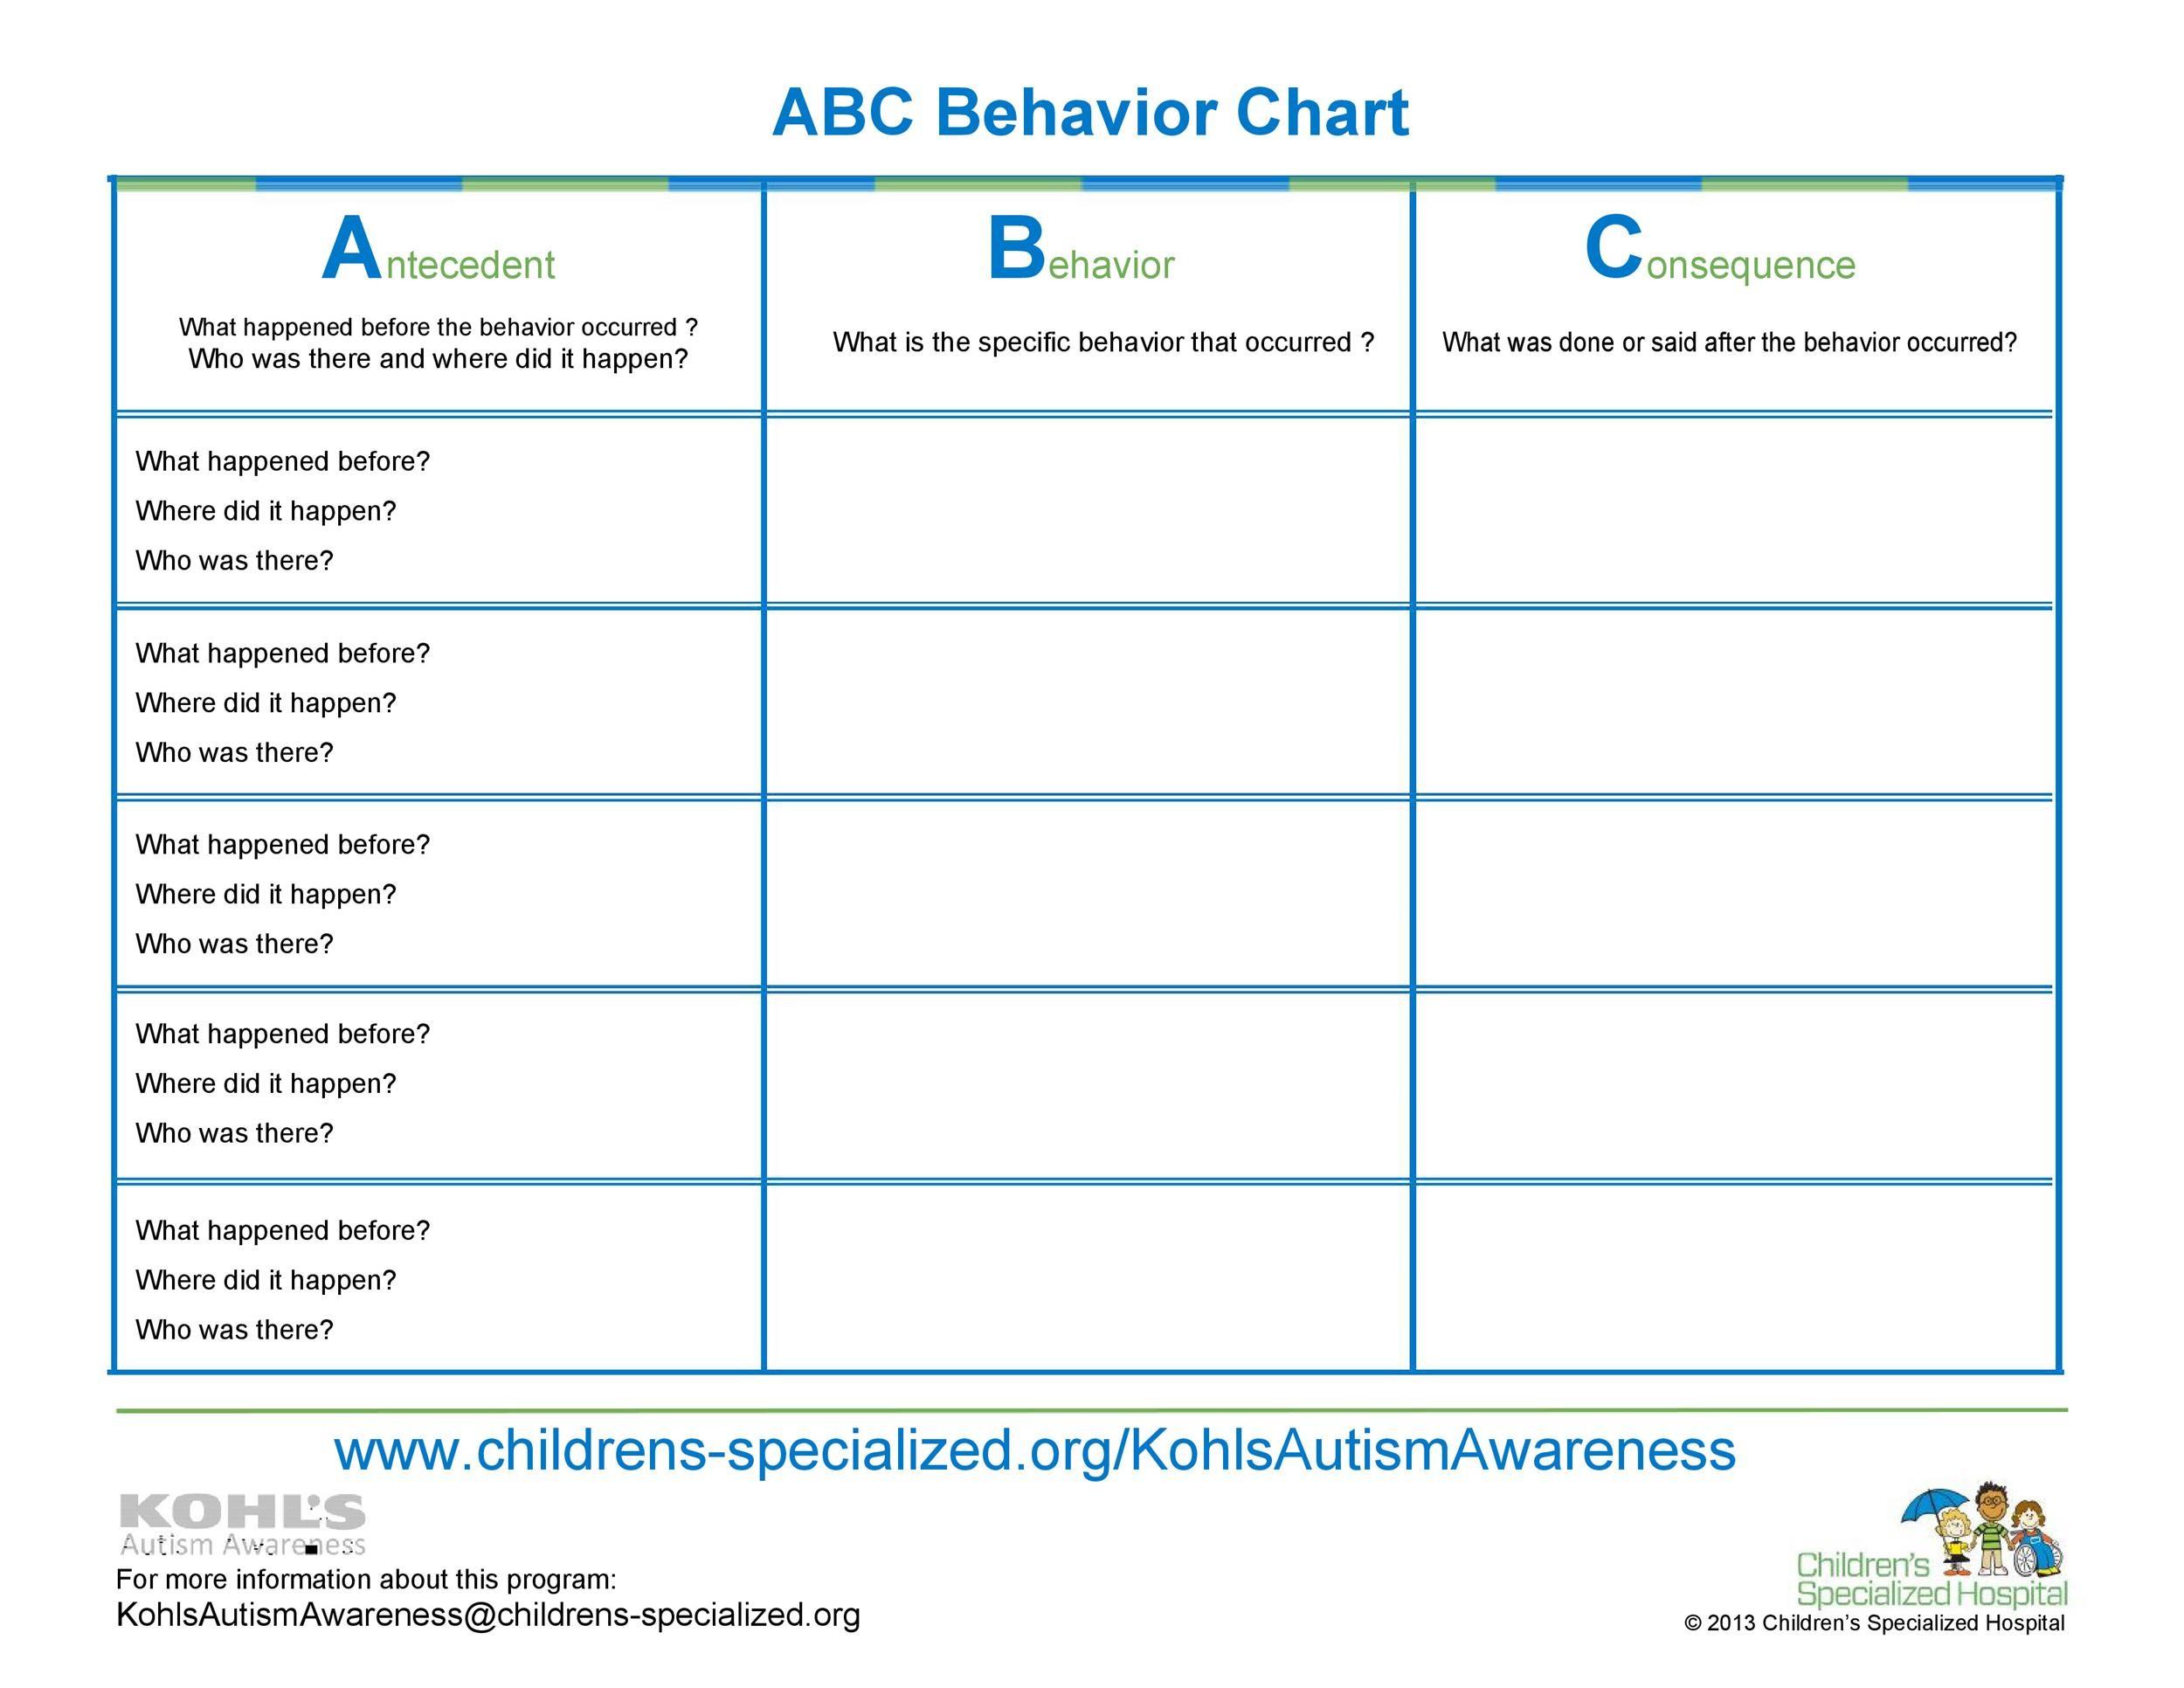 42 Printable Behavior Chart Templates For Kids